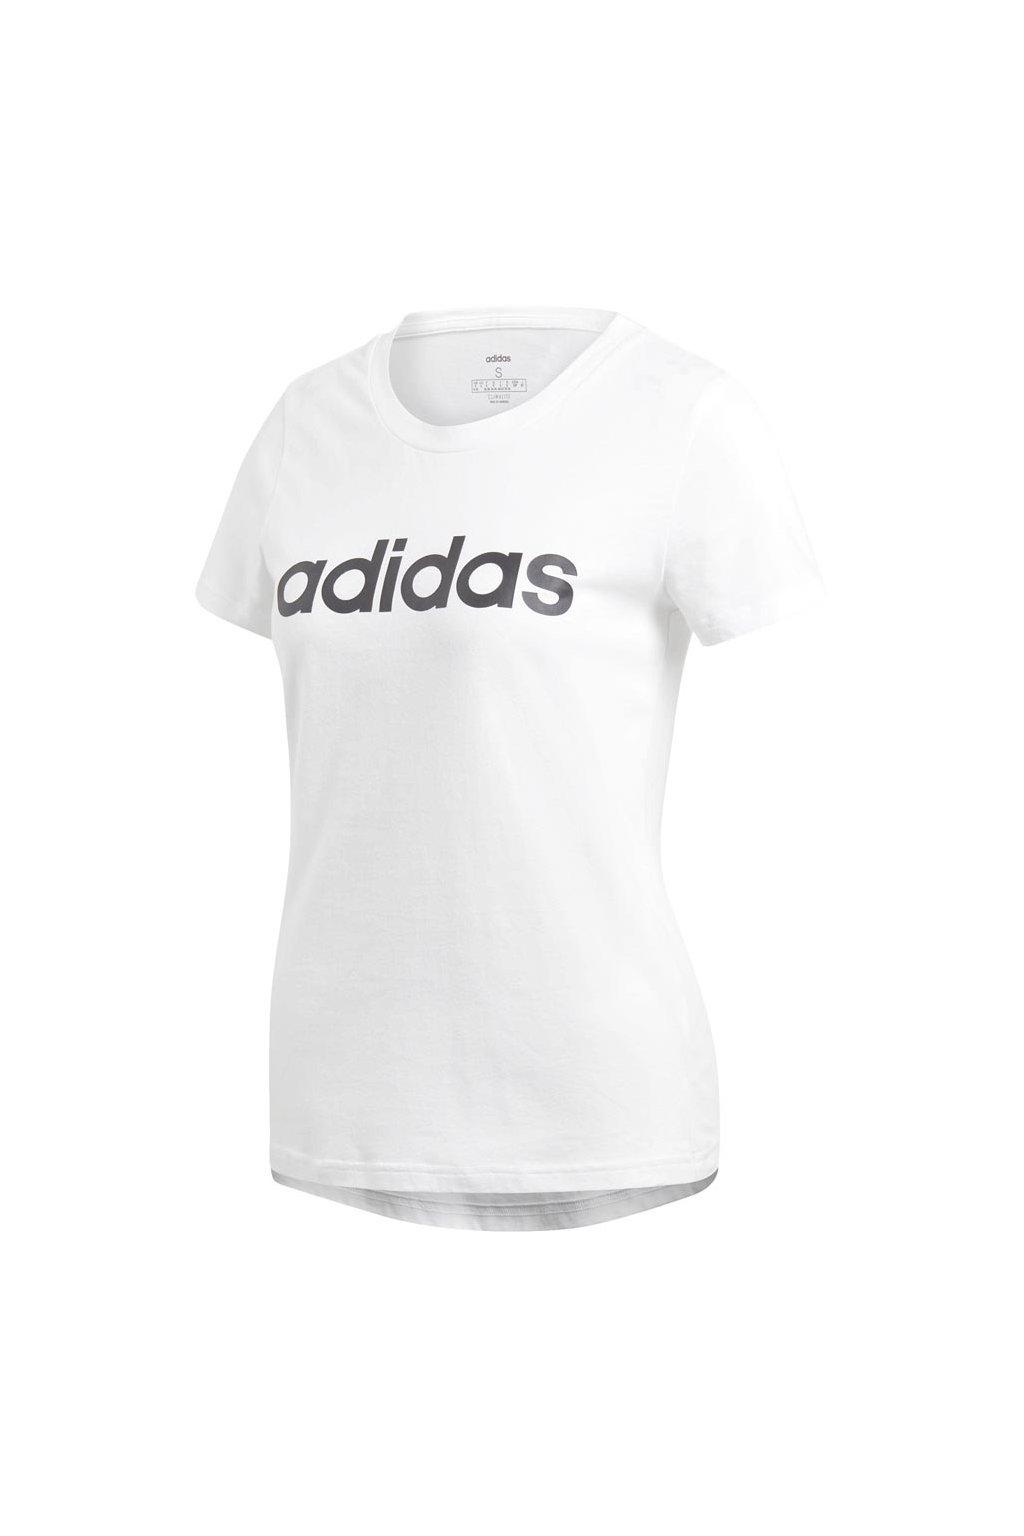 Tričko Adidas Essentials Linear Slim Tee biele DU0629